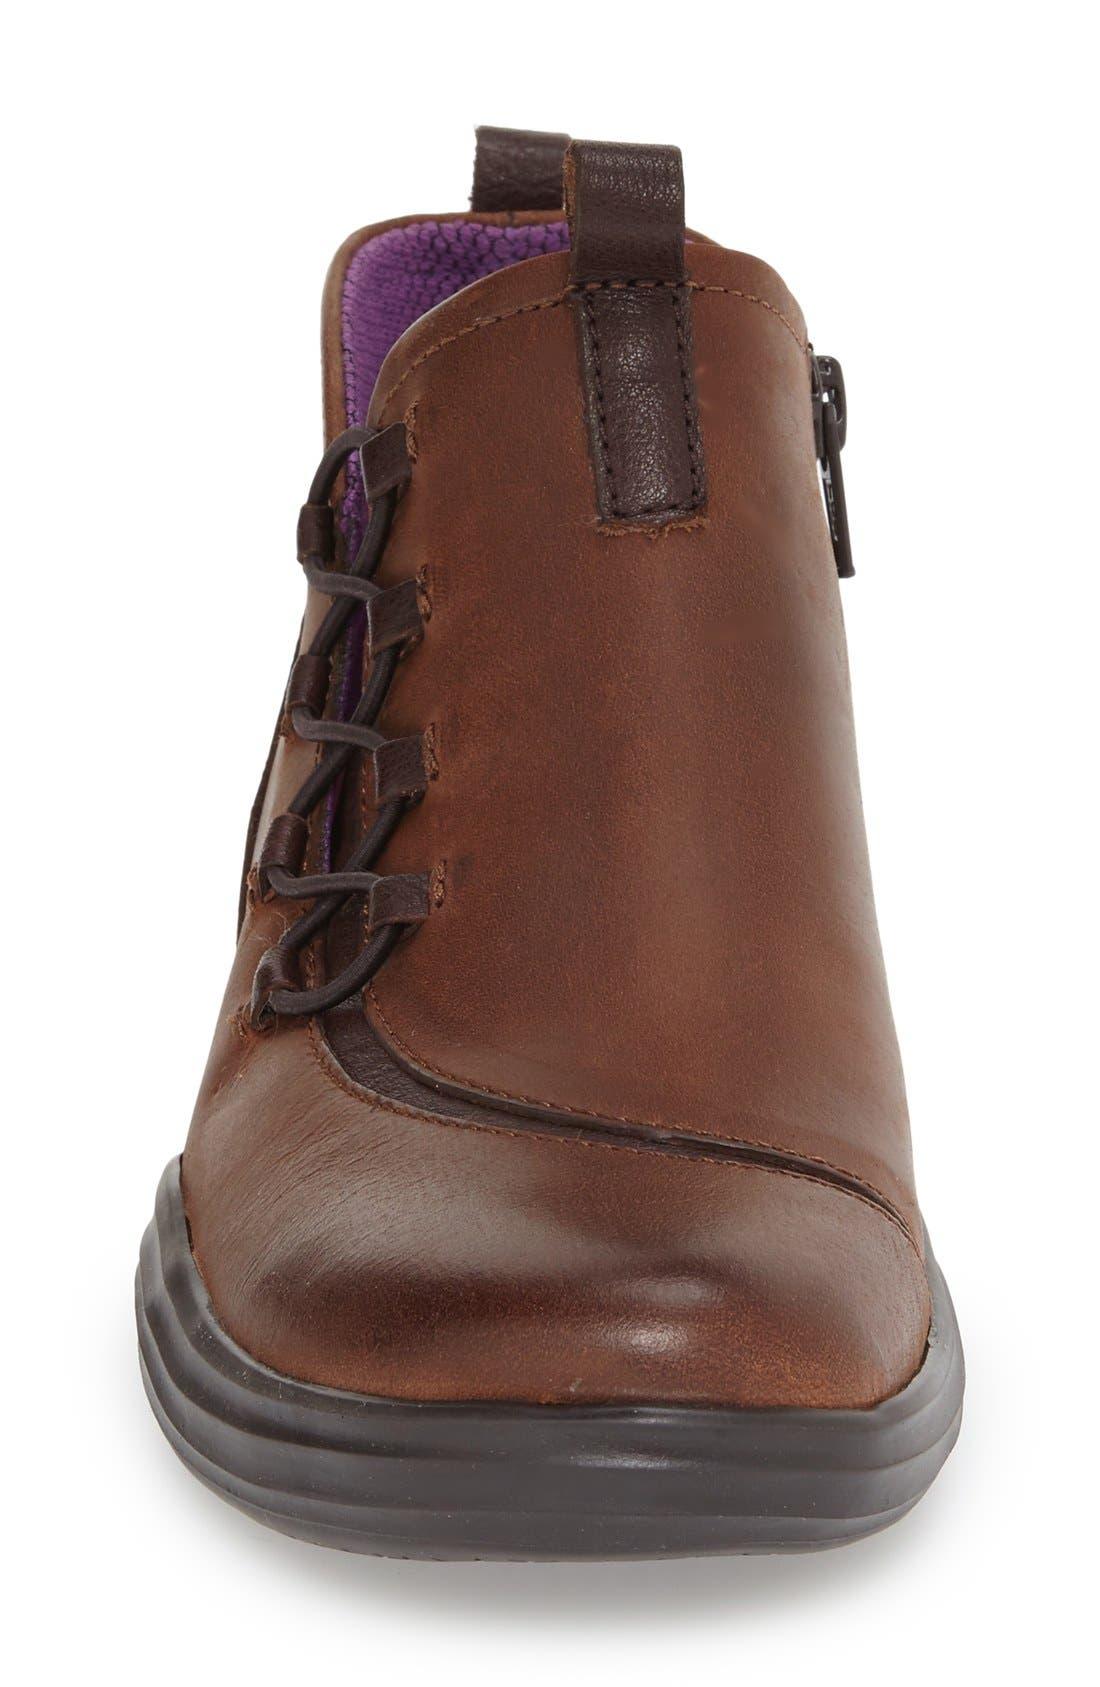 'Santiago' Bootie,                             Alternate thumbnail 3, color,                             Mahogany Oiled Nubuck Leather